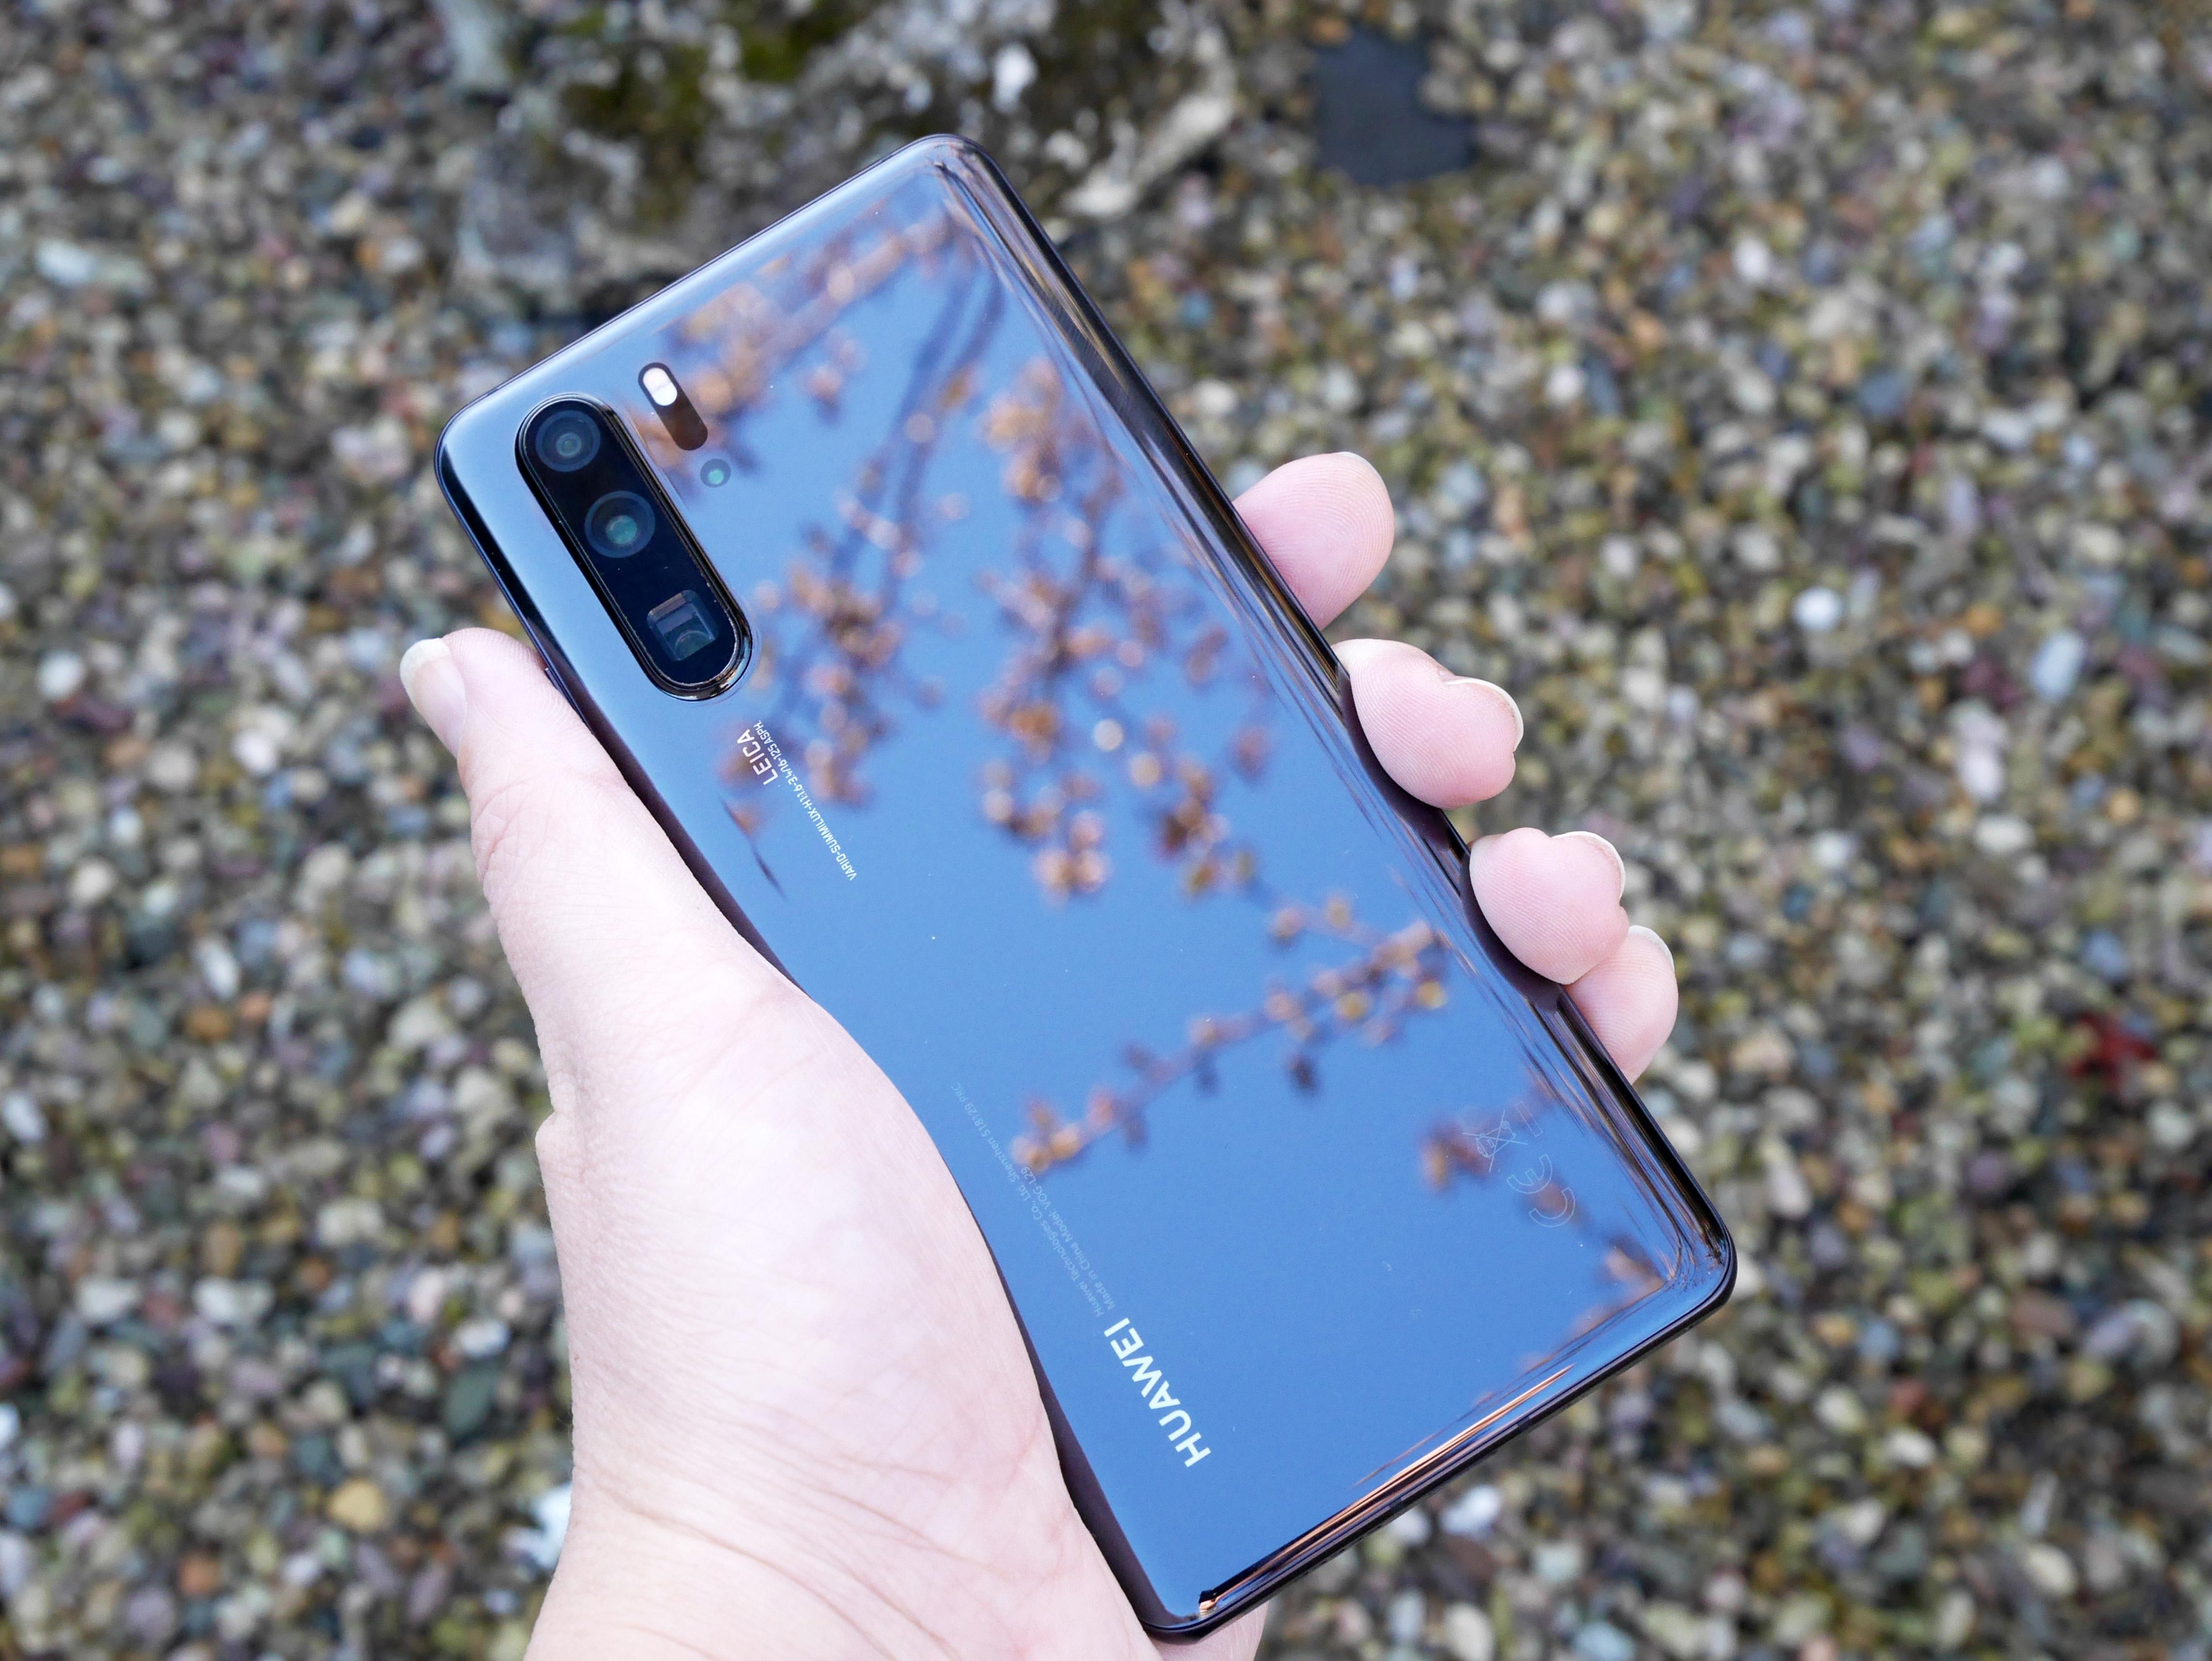 Huawei P30 Pro Smartphone Full Review | ePHOTOzine